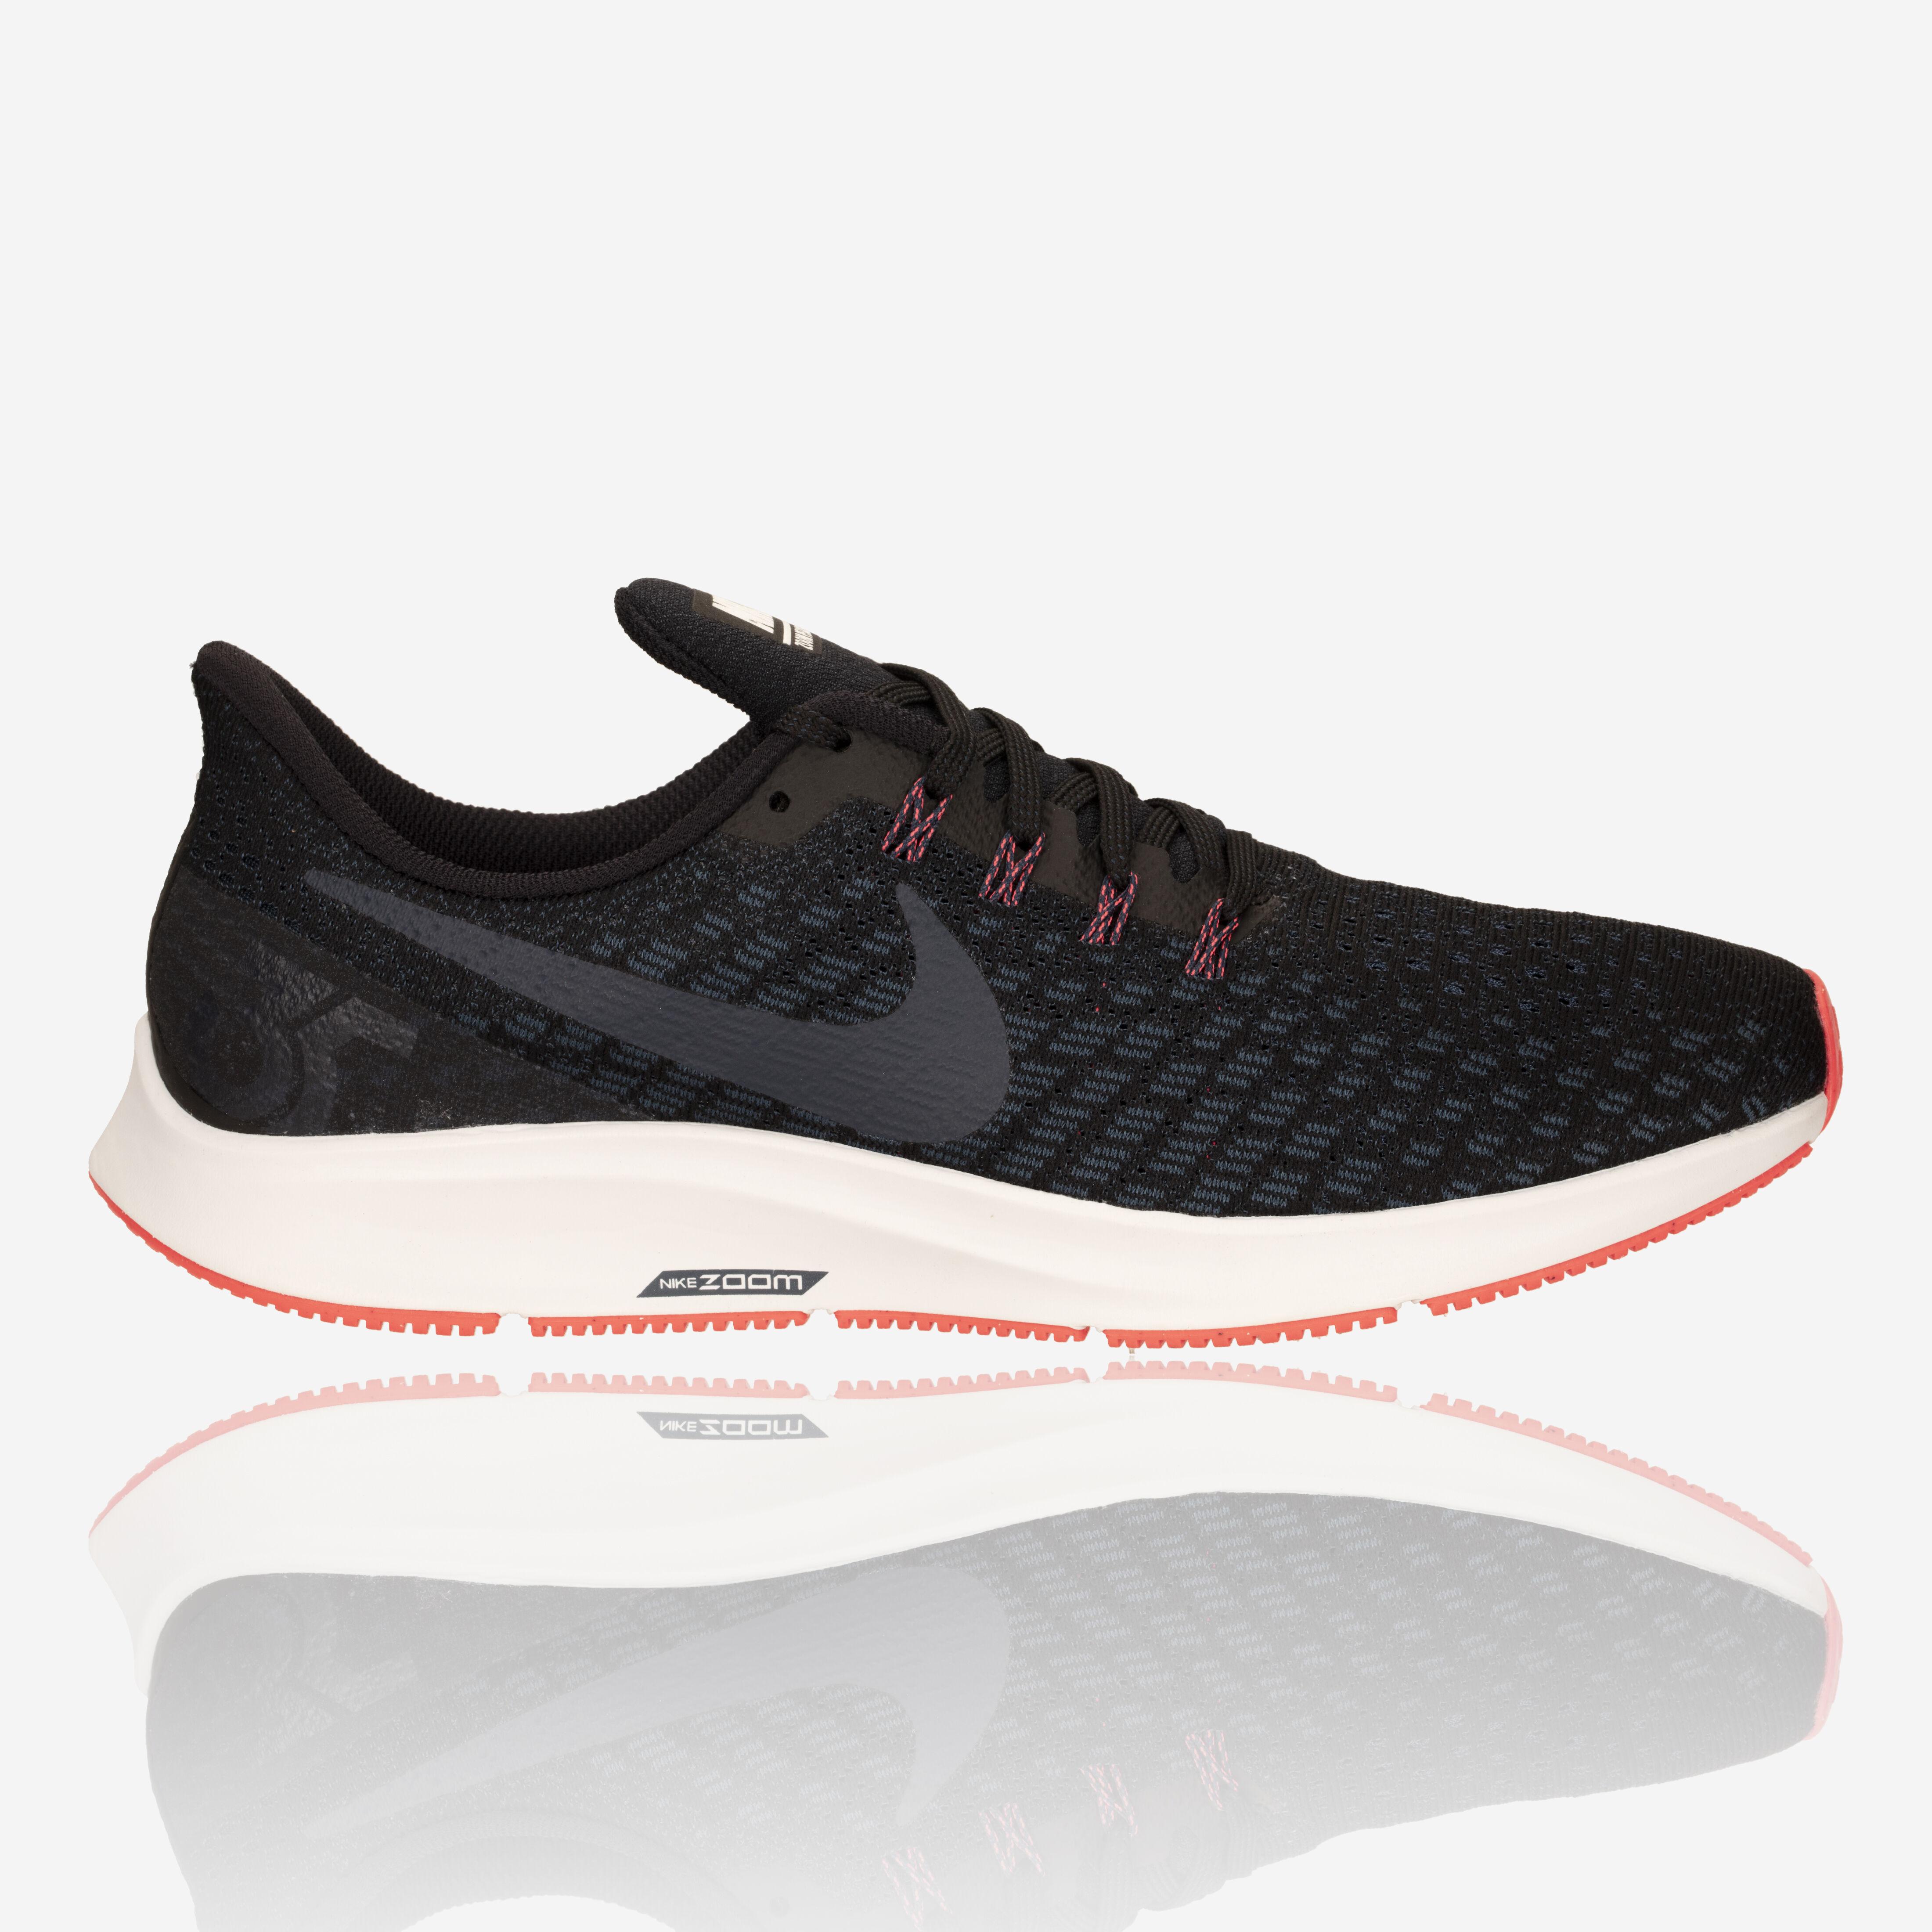 38cc786d0ffa Nike Air Zoom Pegasus 35 shoes 2019 RUNKD online running store